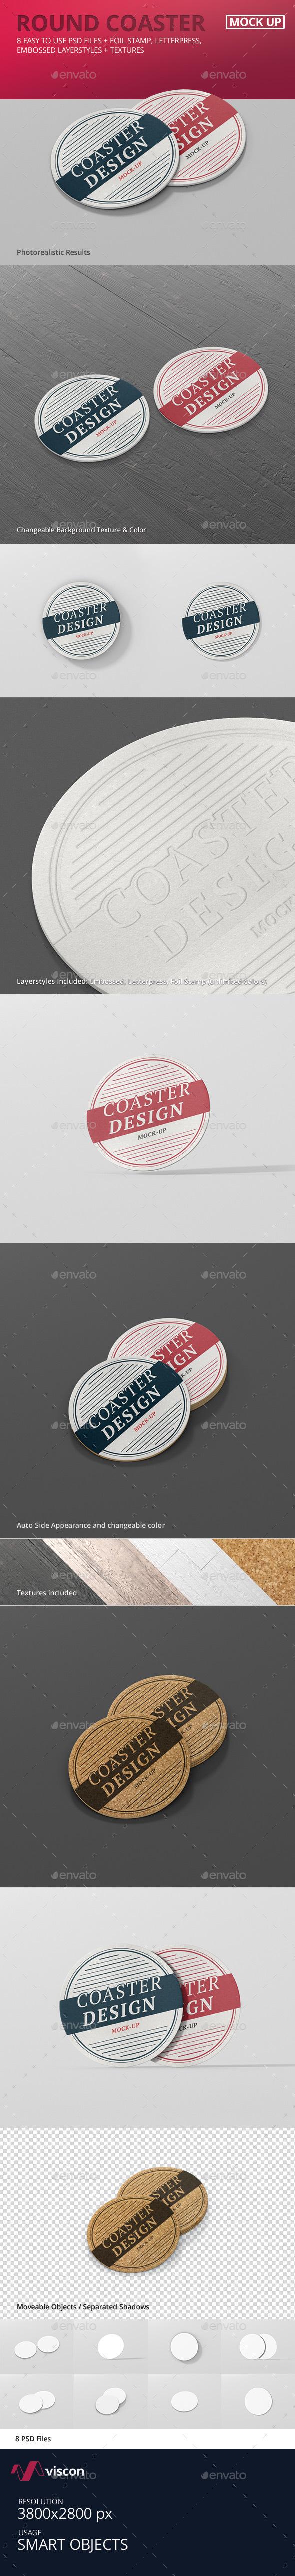 Round Coaster Mock-Up - Stationery Print